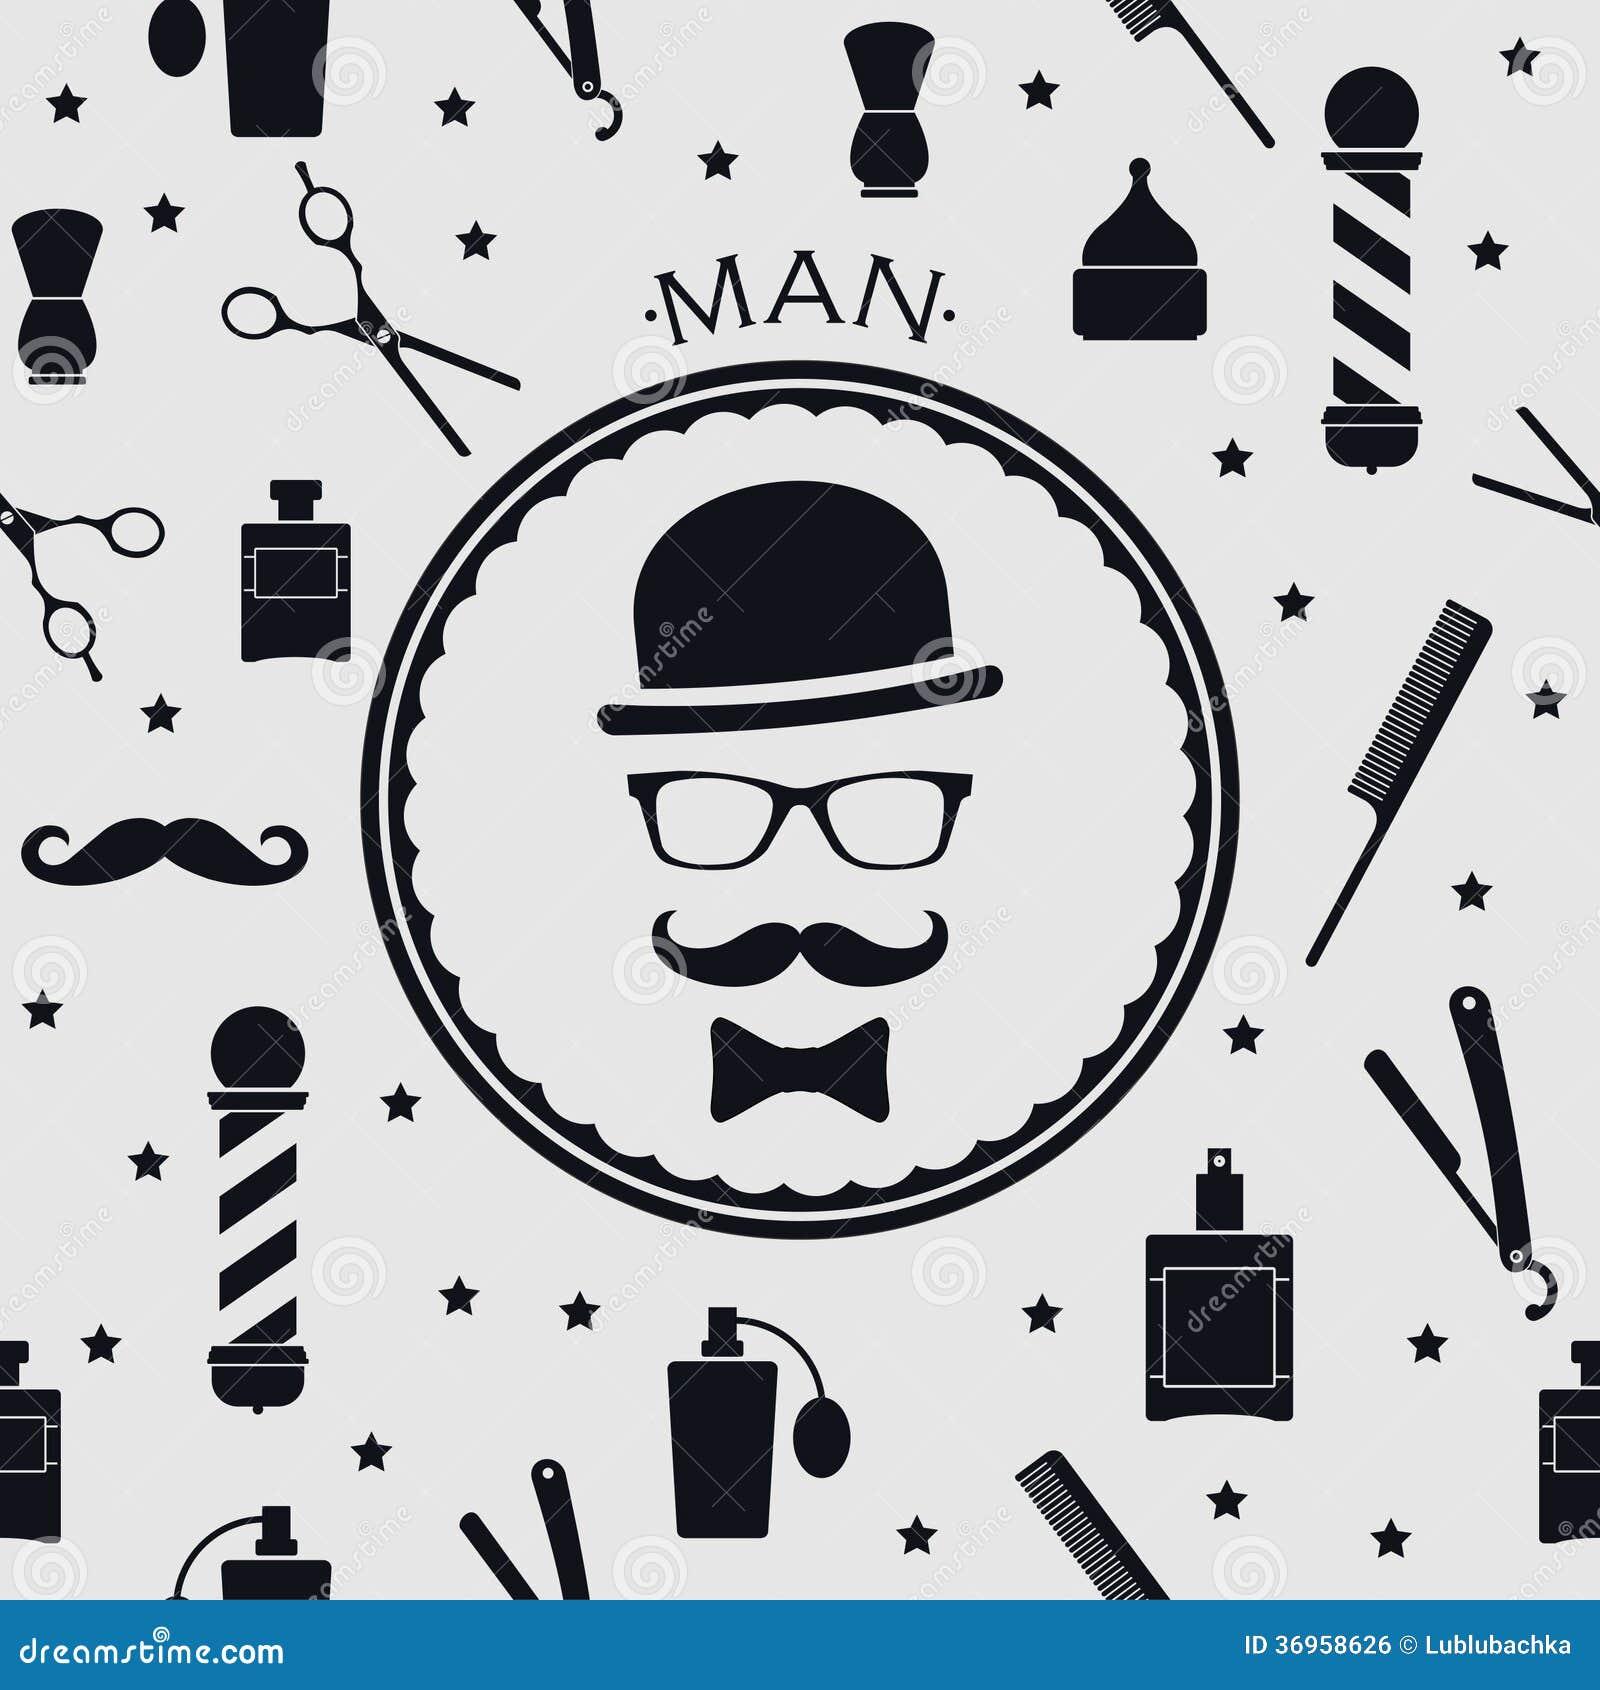 Clip art vector of vintage barber shop logo graphics and icon vector - Background Barber Barbershop Vector Vintage